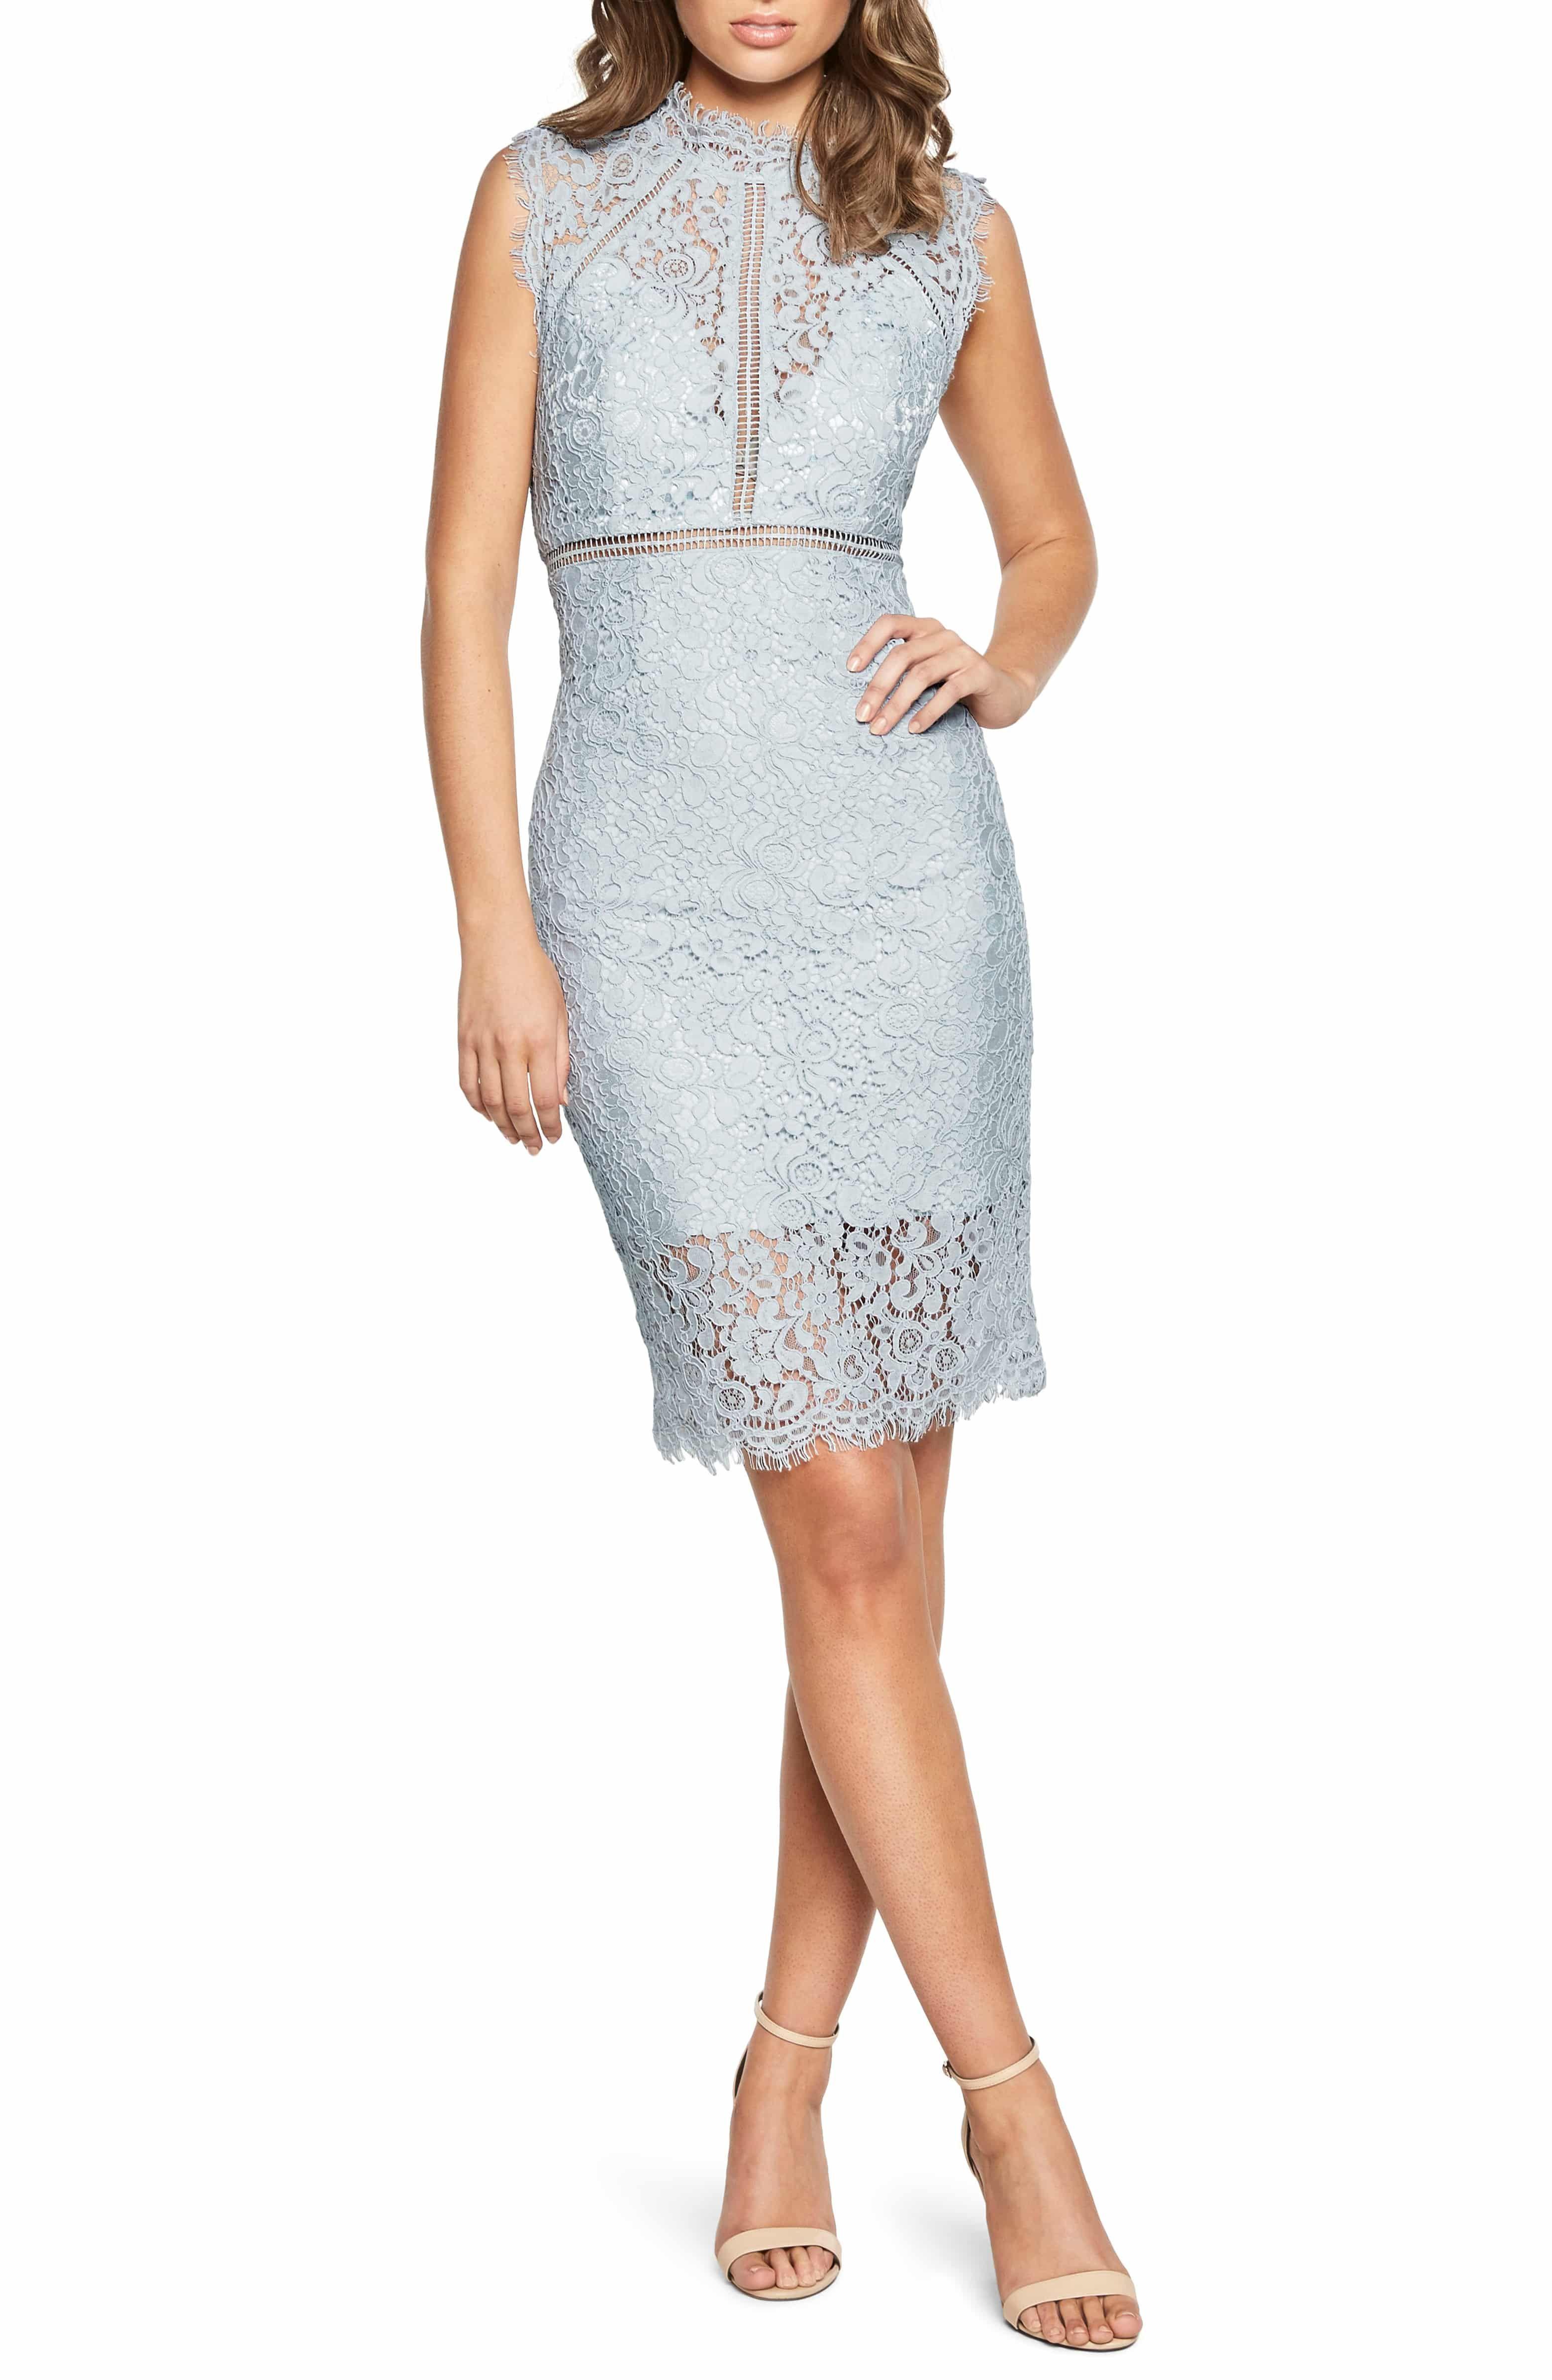 Bardot Lace Sheath Cocktail Dress Nordstrom Lace Sheath Dress Summer Cocktail Dress Sheath Dress [ 4784 x 3120 Pixel ]